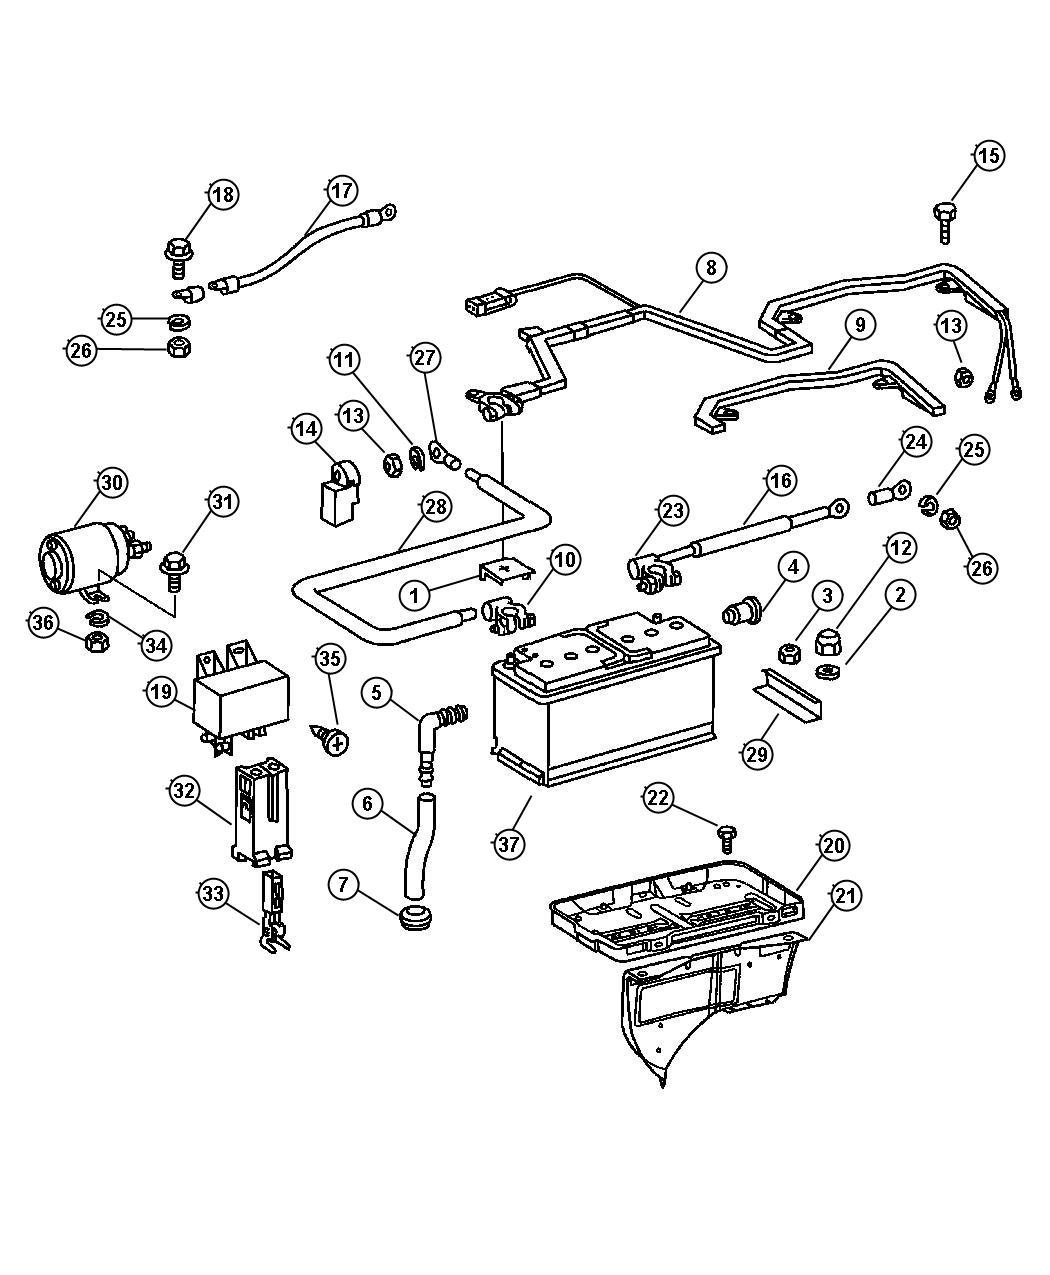 Dodge Sprinter Battery Location